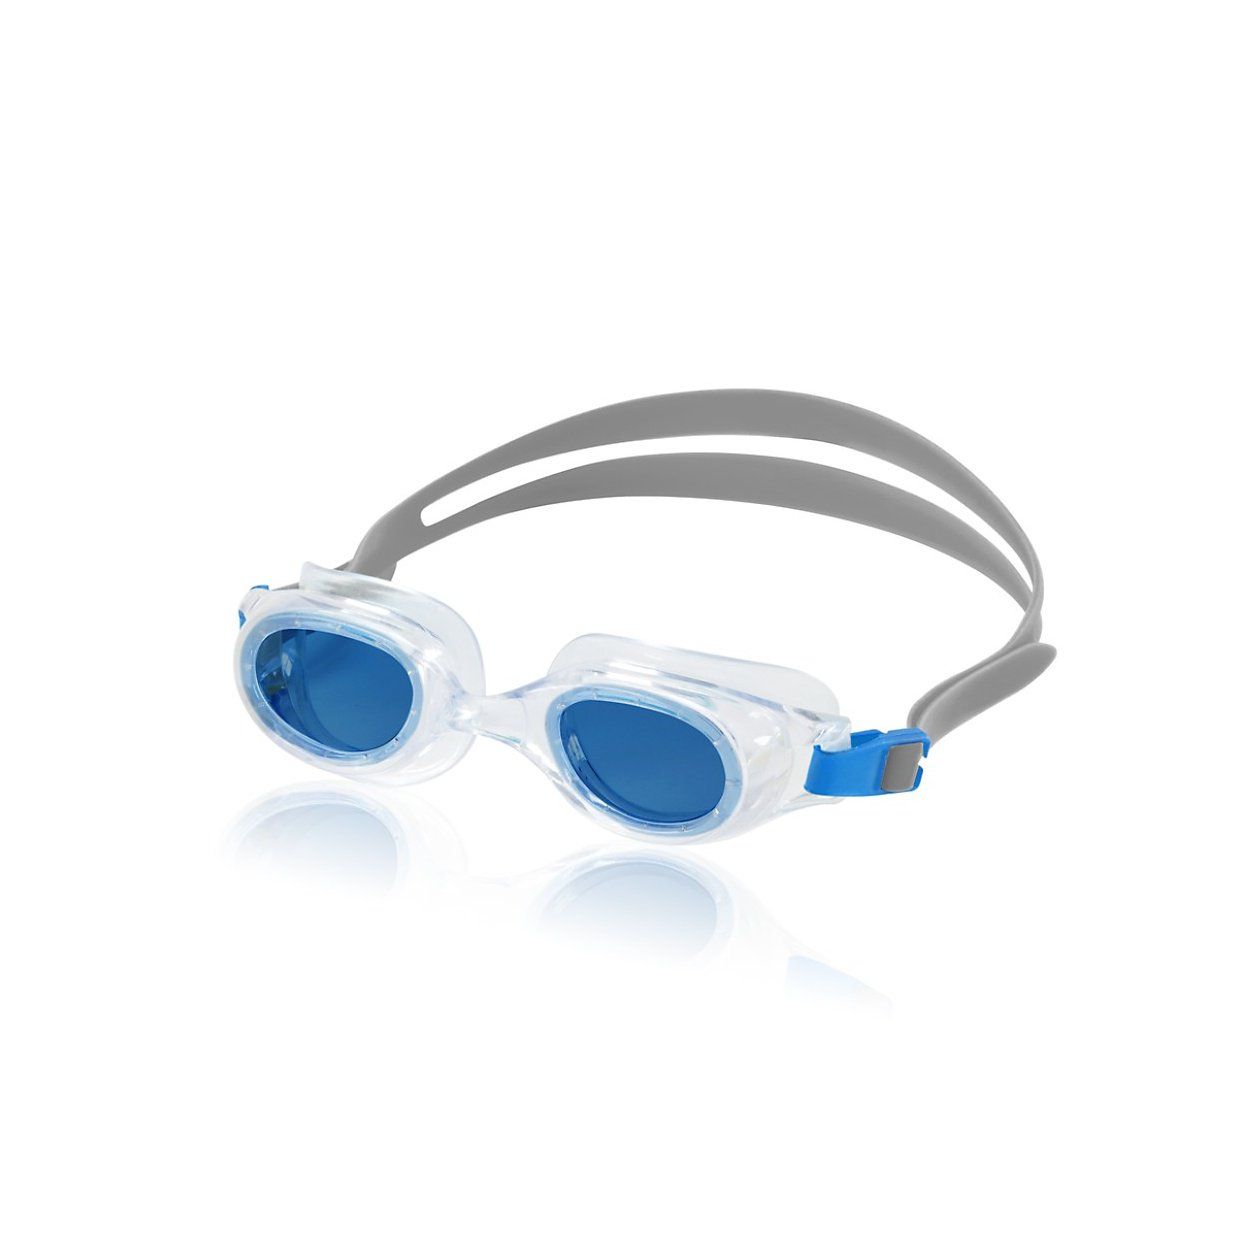 ca3818cbb1 Speedo Recreation Hydrospex Classic Swim Swimming Goggles - Light Blue